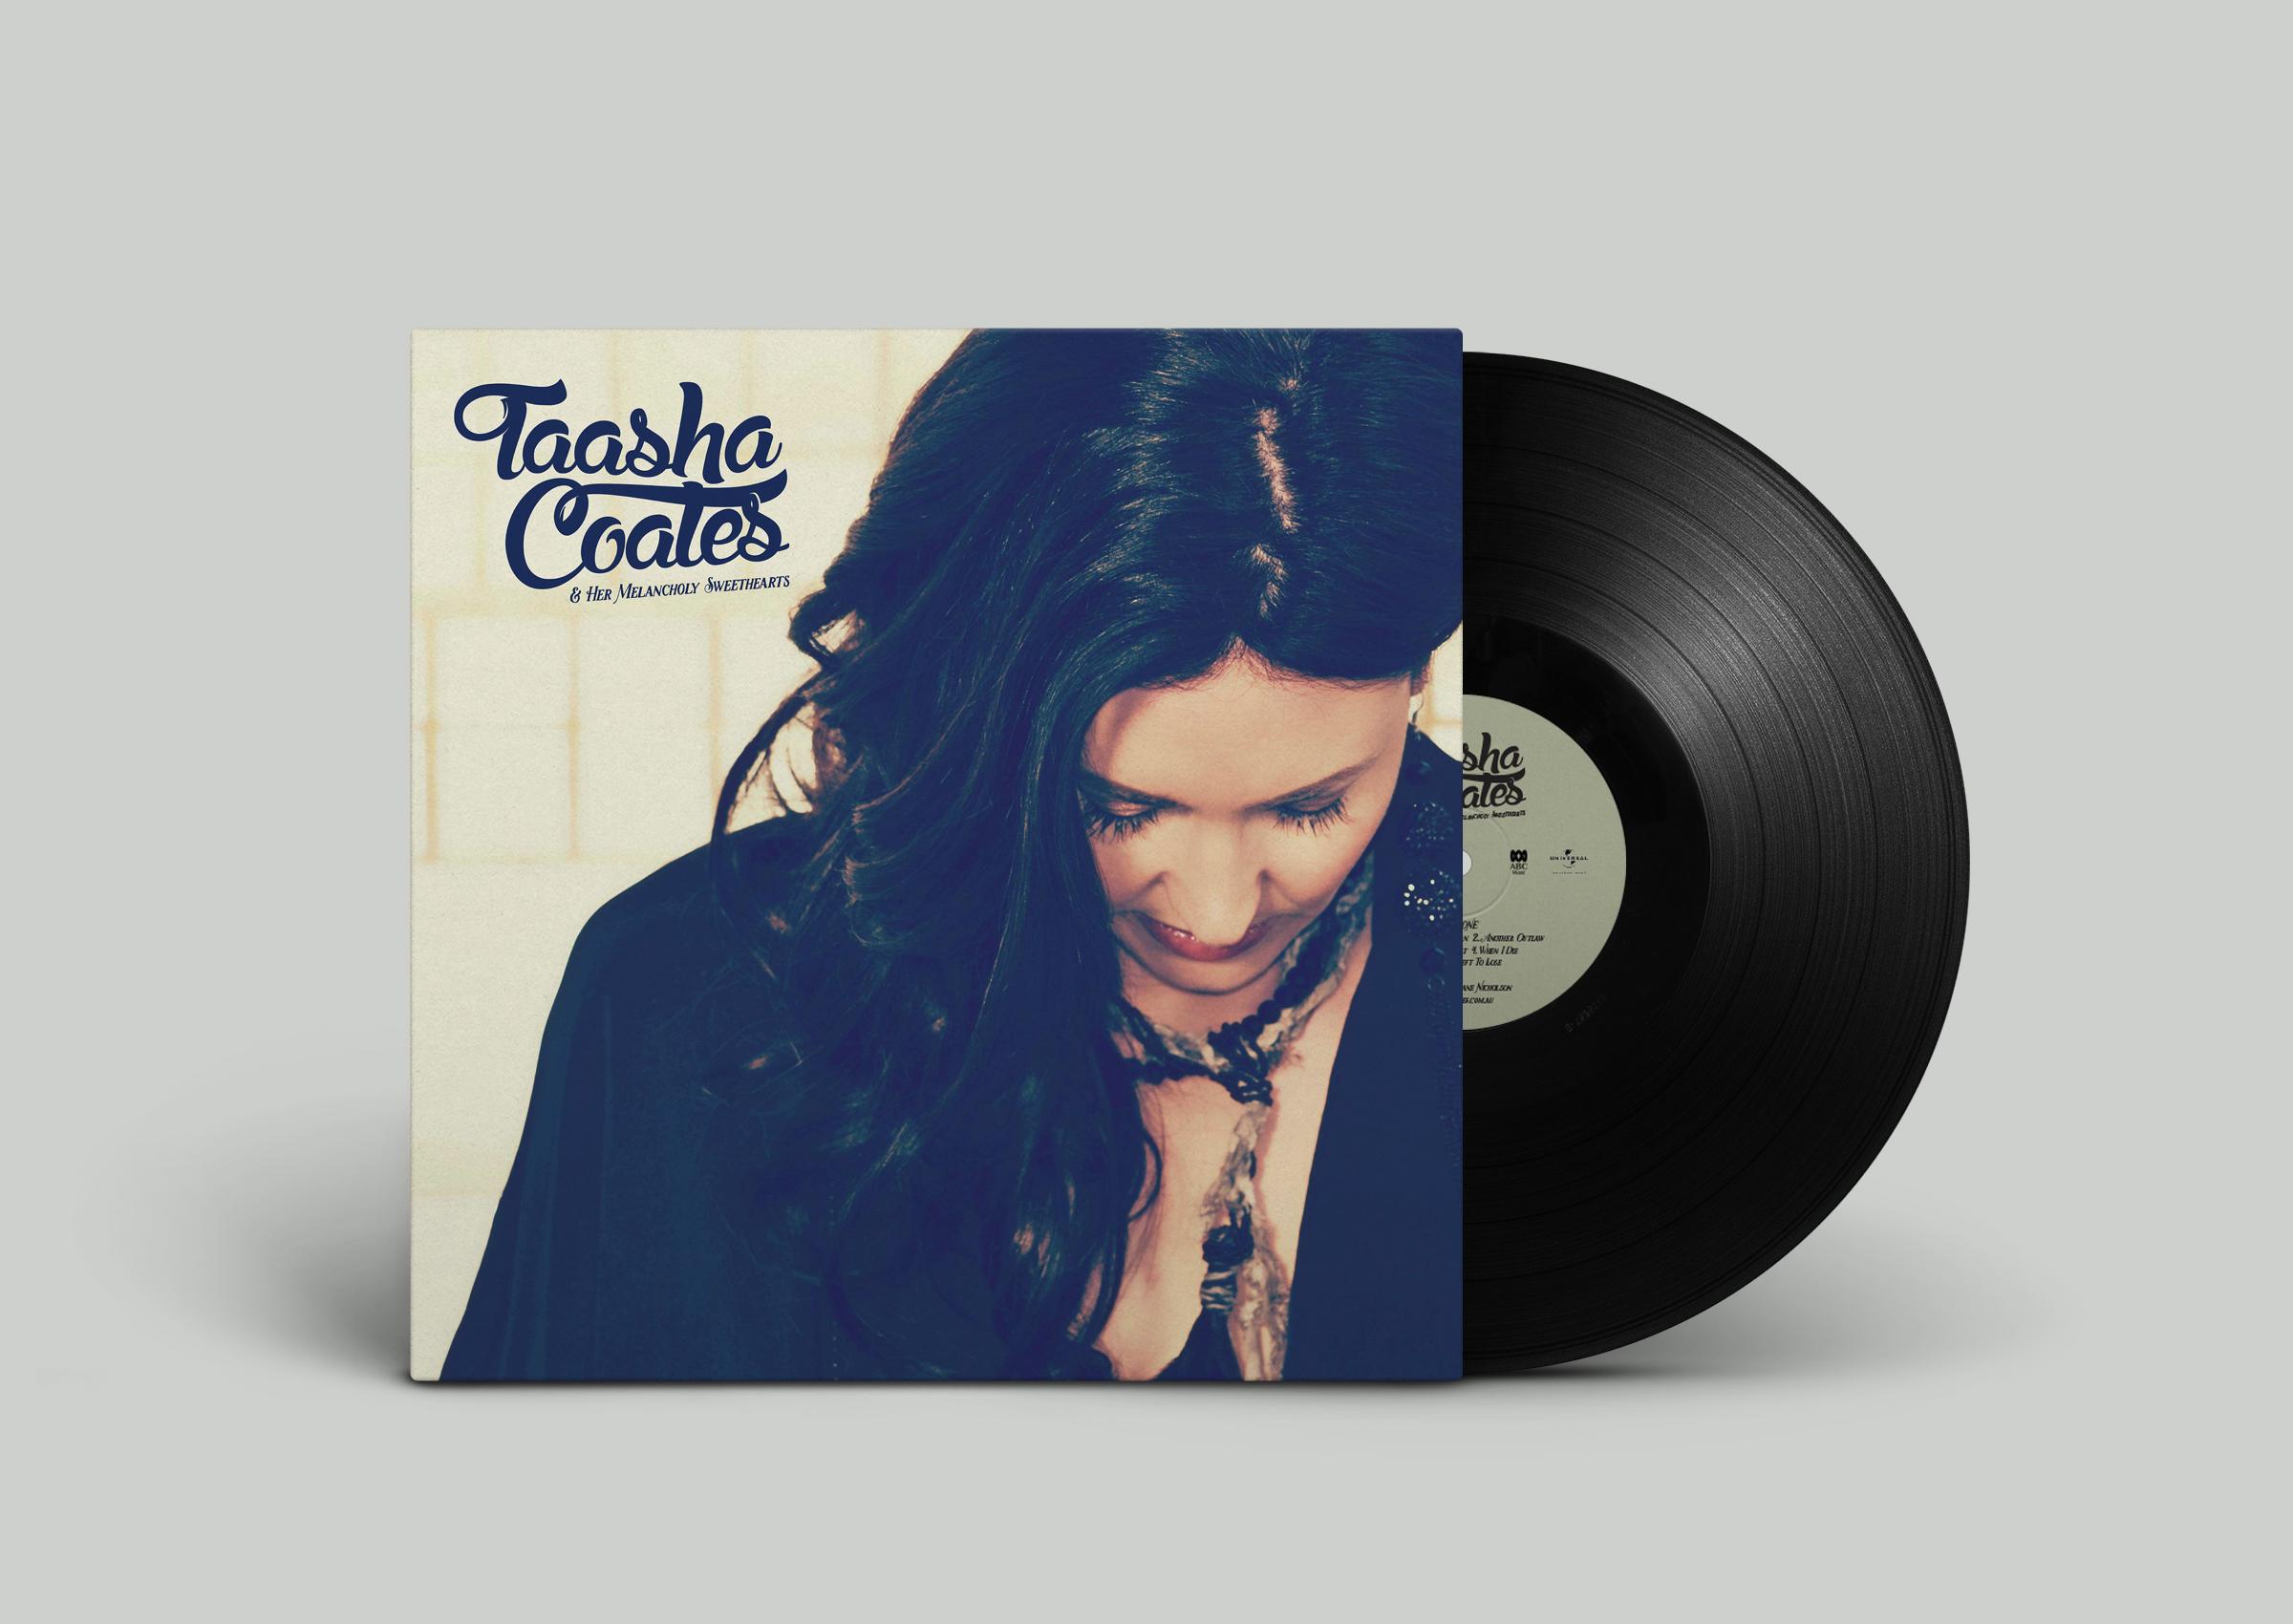 taasha-coates-vinyl-sleeve